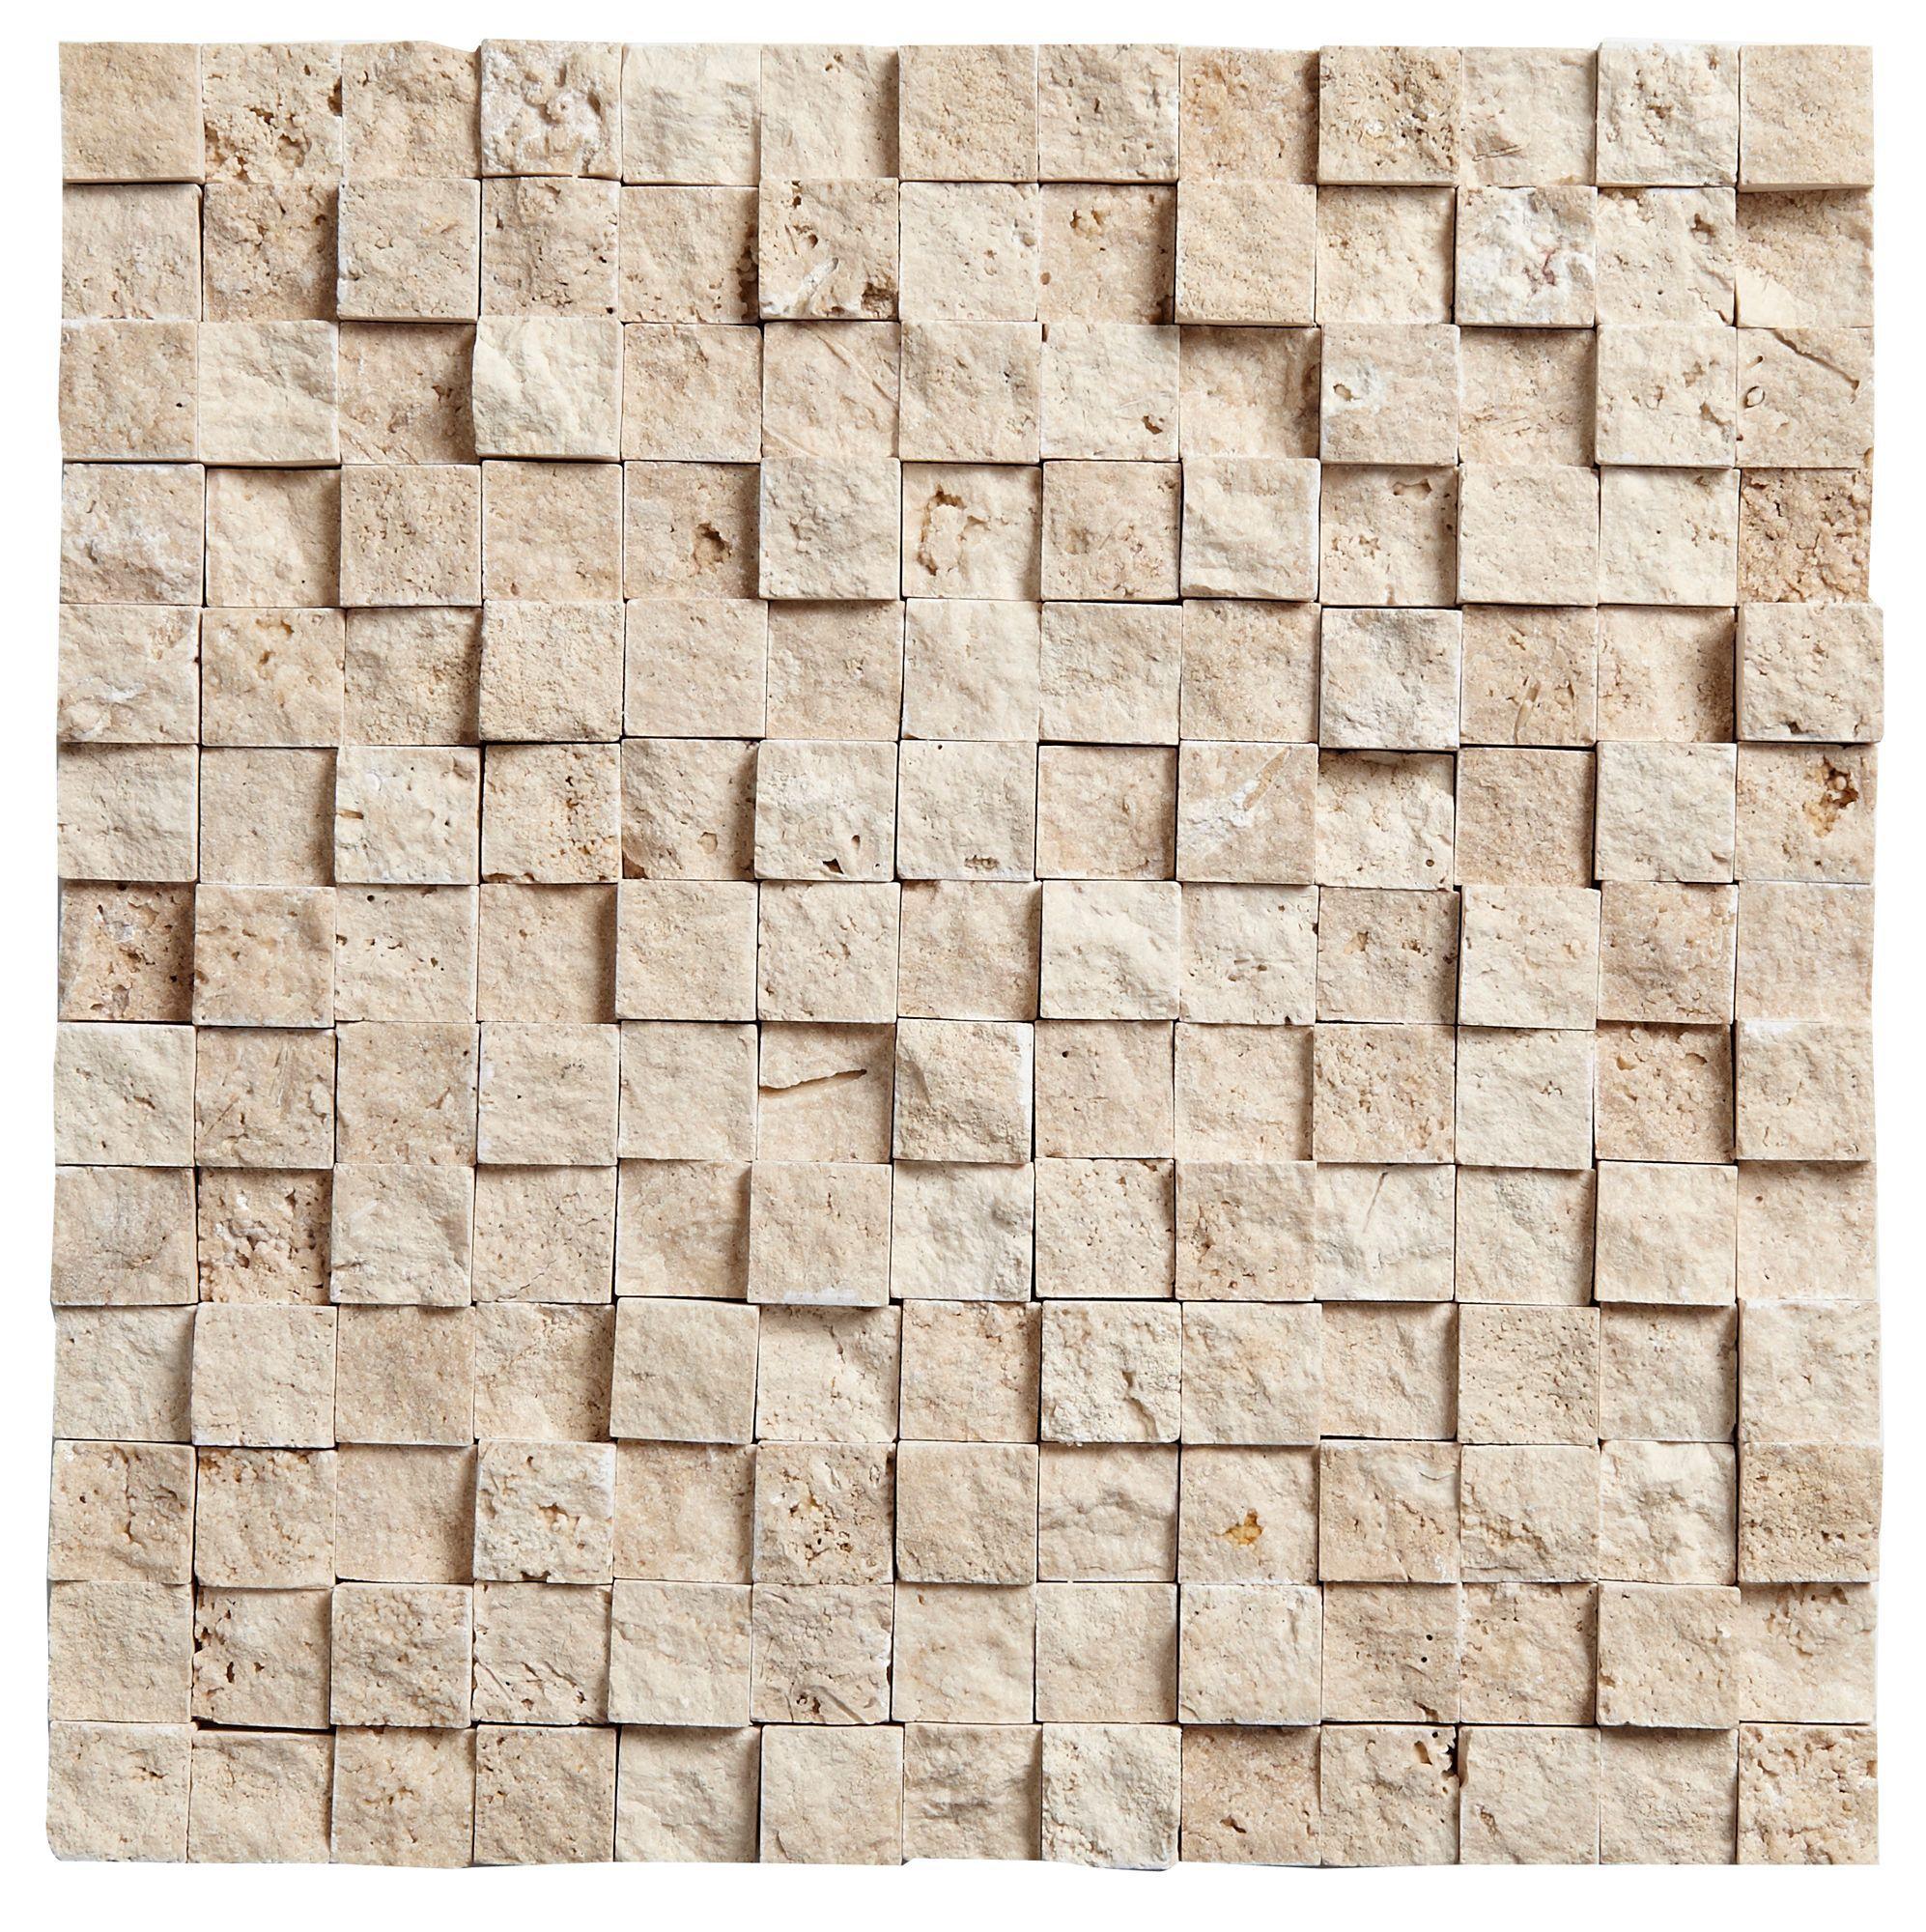 Natural Travertine Mosaic Tile L 300mm W 300mm: Natural 3D Cubed Mosaic Stone Wall Tile, (L)300mm (W)300mm